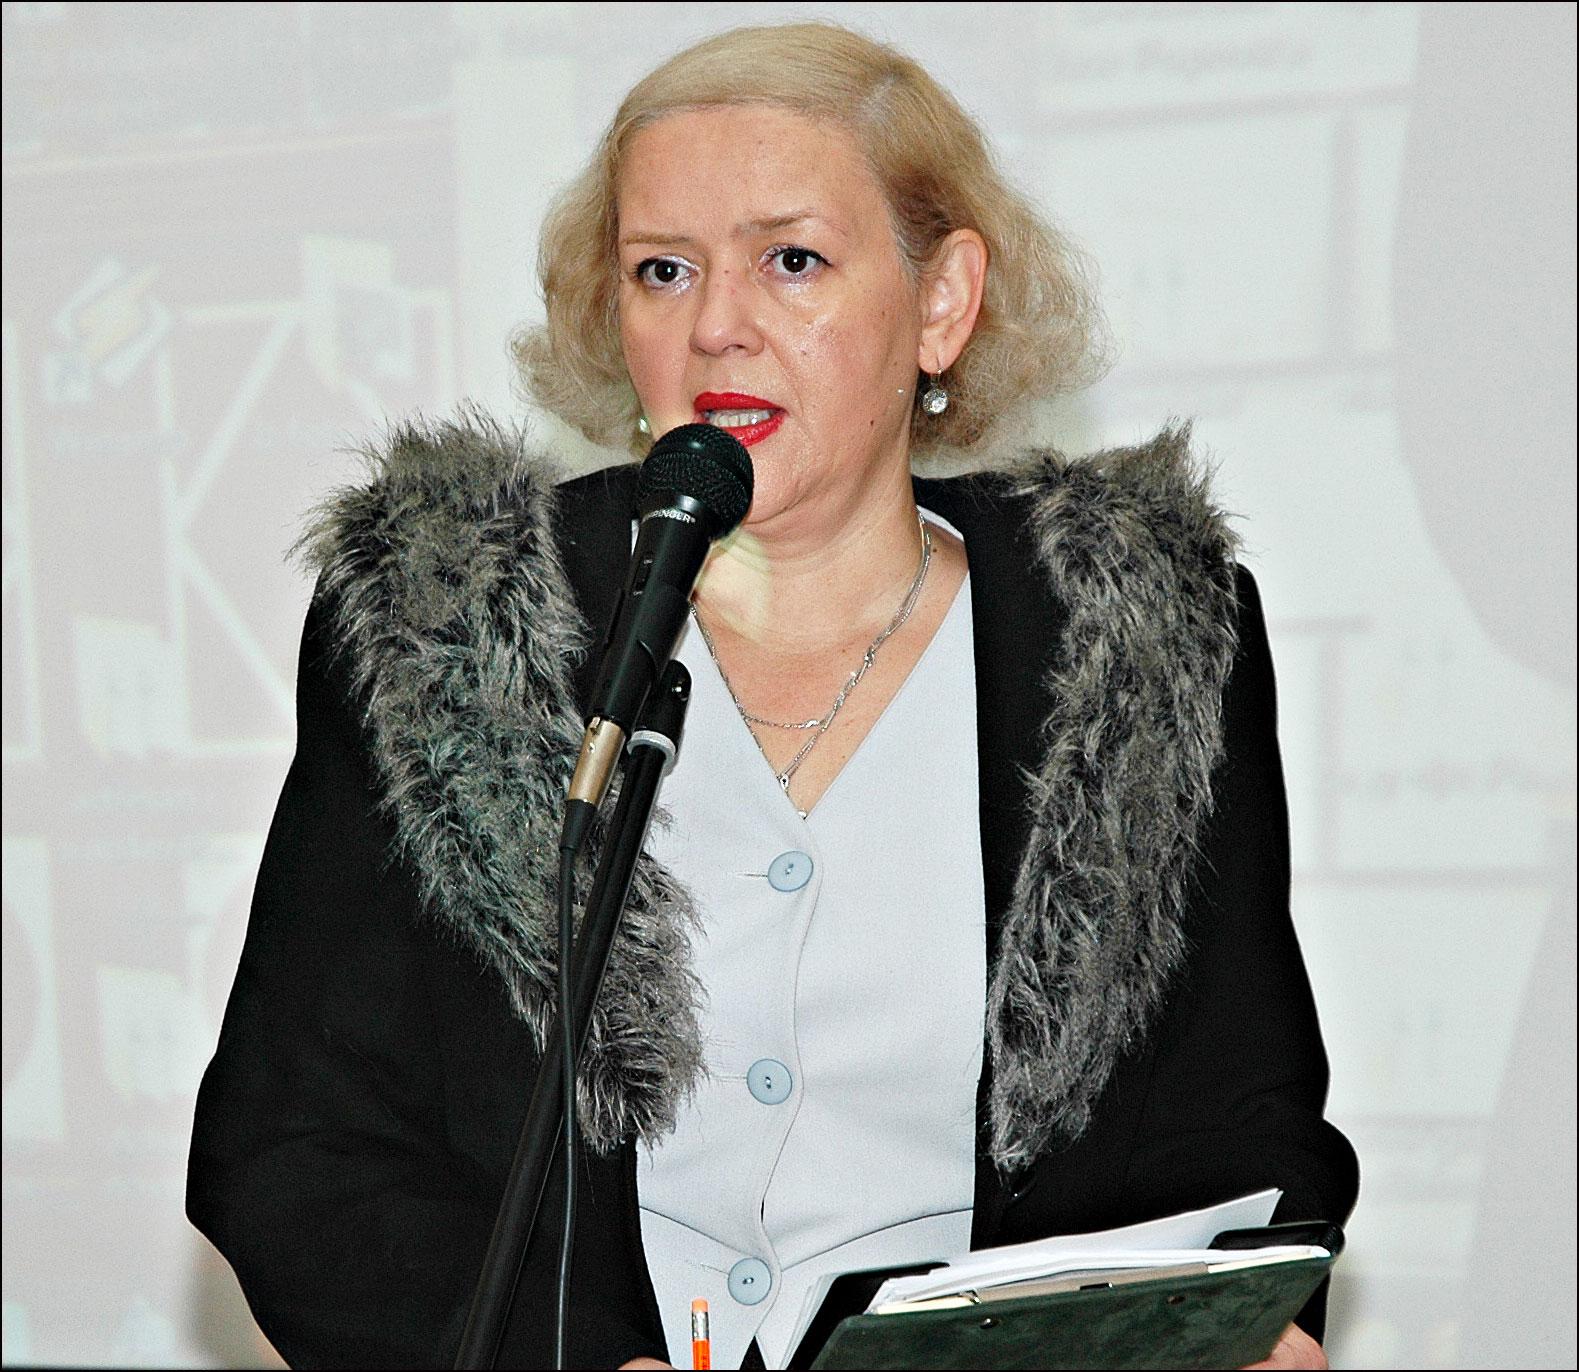 Lela Pavlović